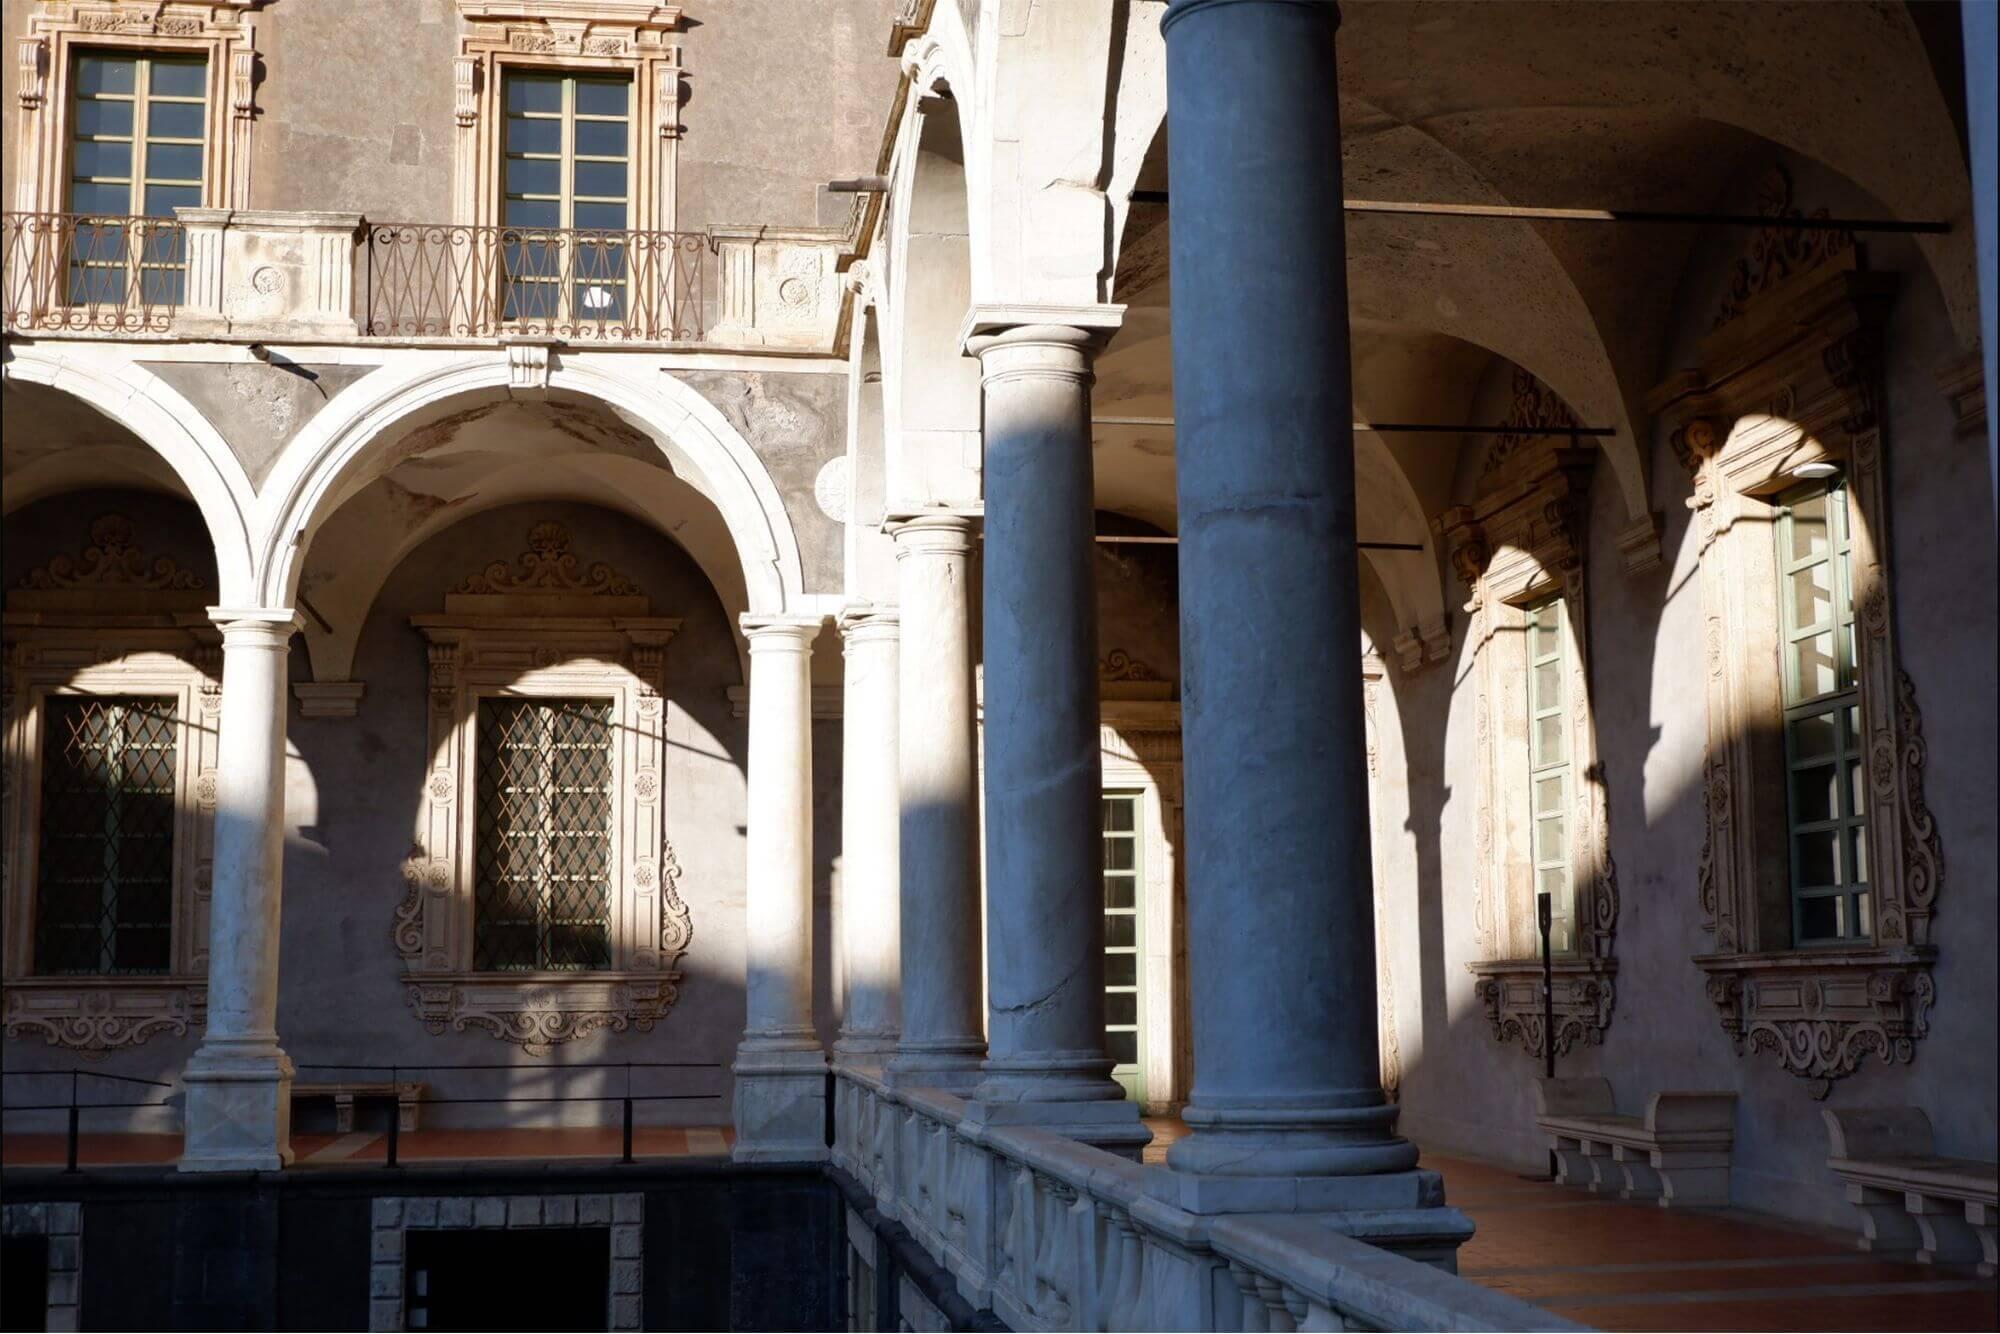 monastero2 compressor WEEKEND A CATANIA